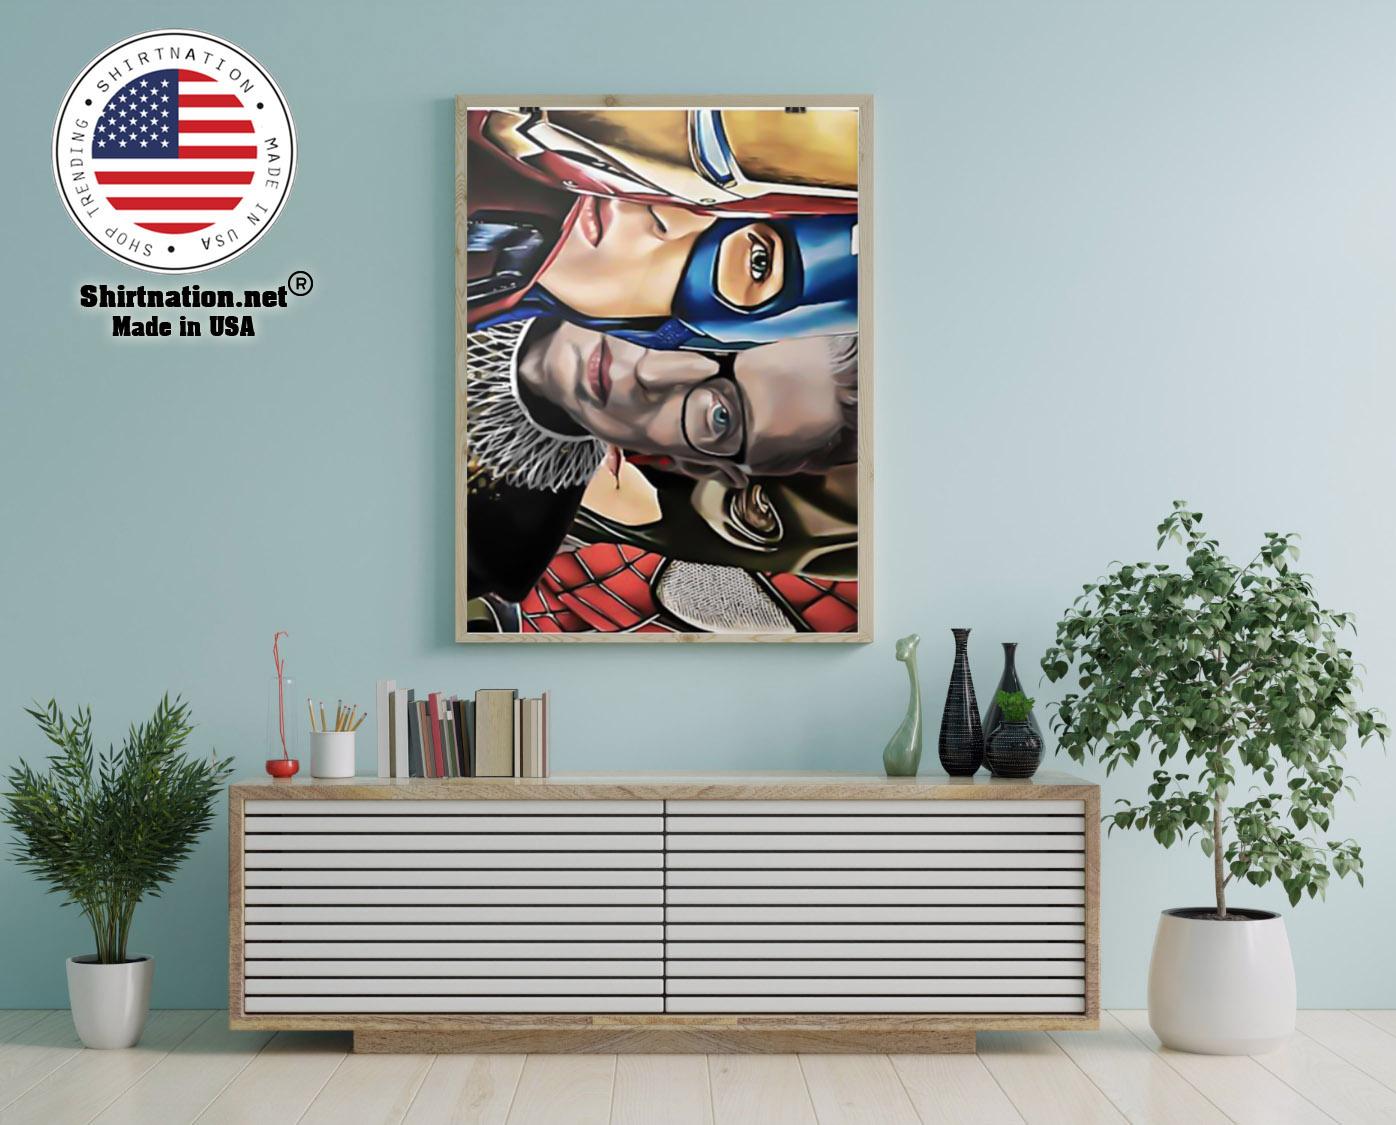 Ruth Bader Ginsburg super heroes poster 22